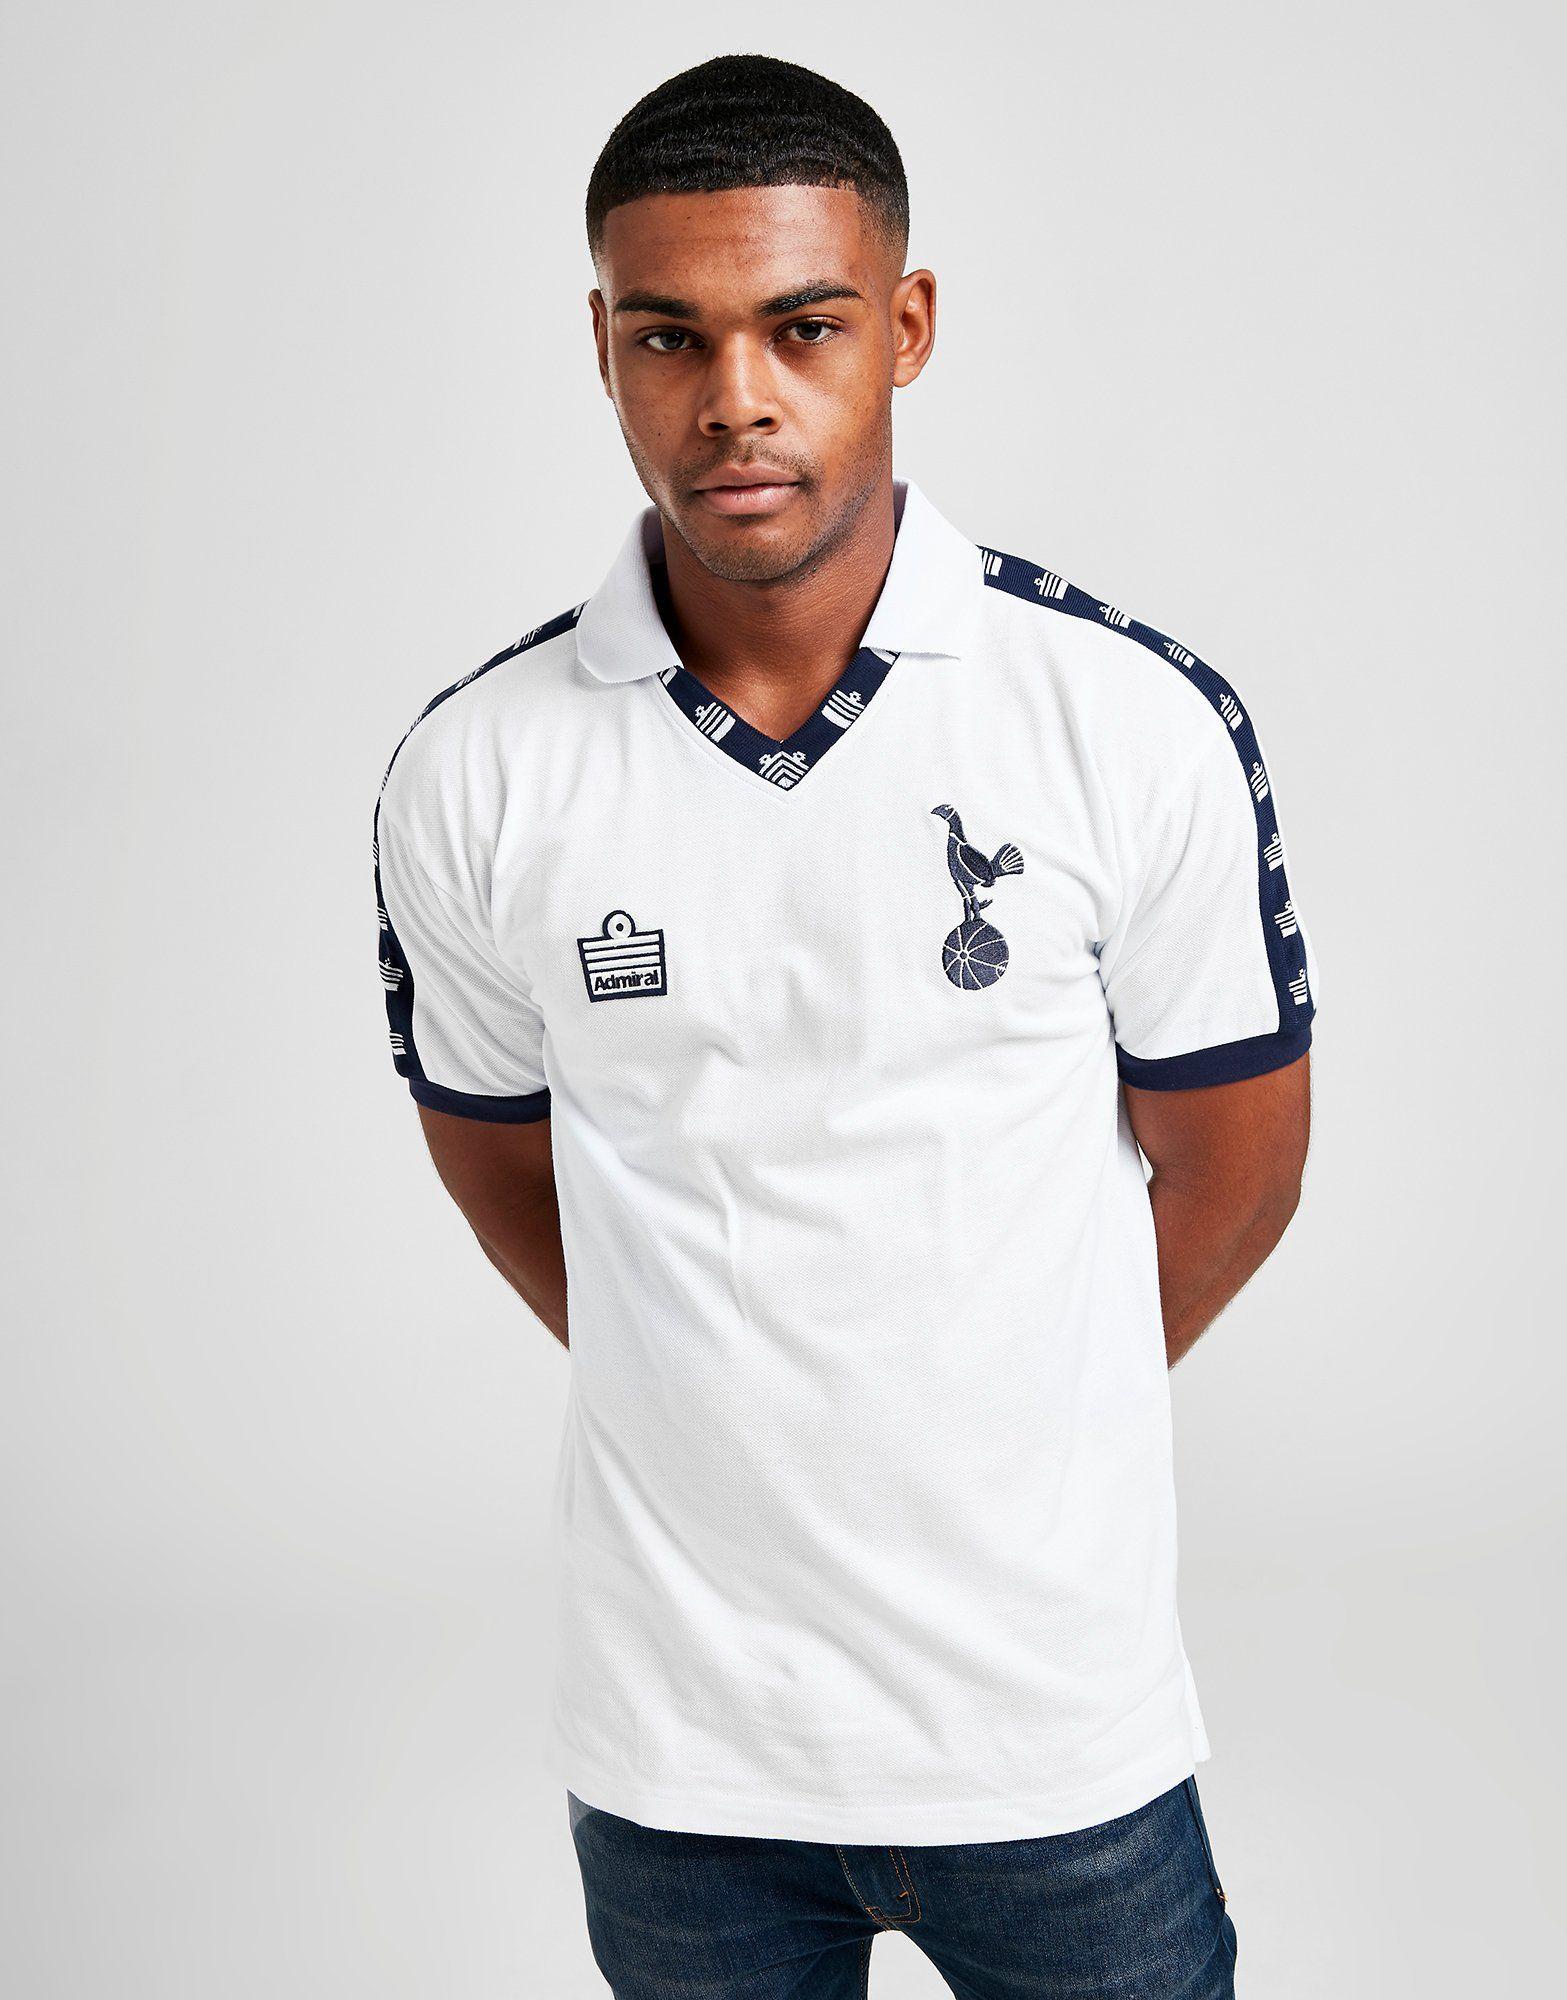 Score Draw Tottenham Hotspur '78 Home Shirt